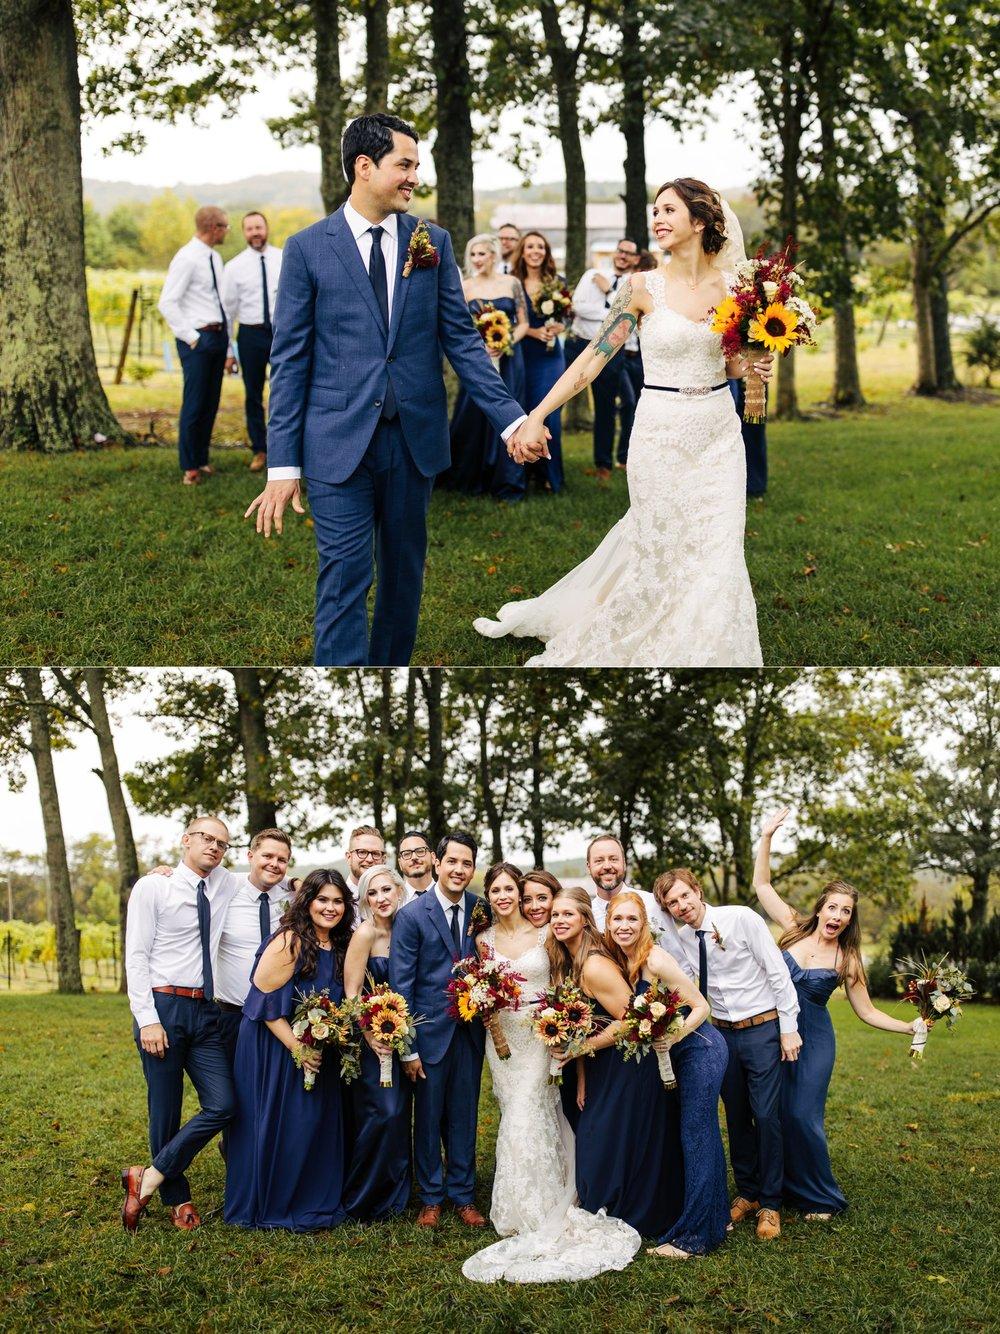 CK-Photo-arrington-wedding_0019.jpg